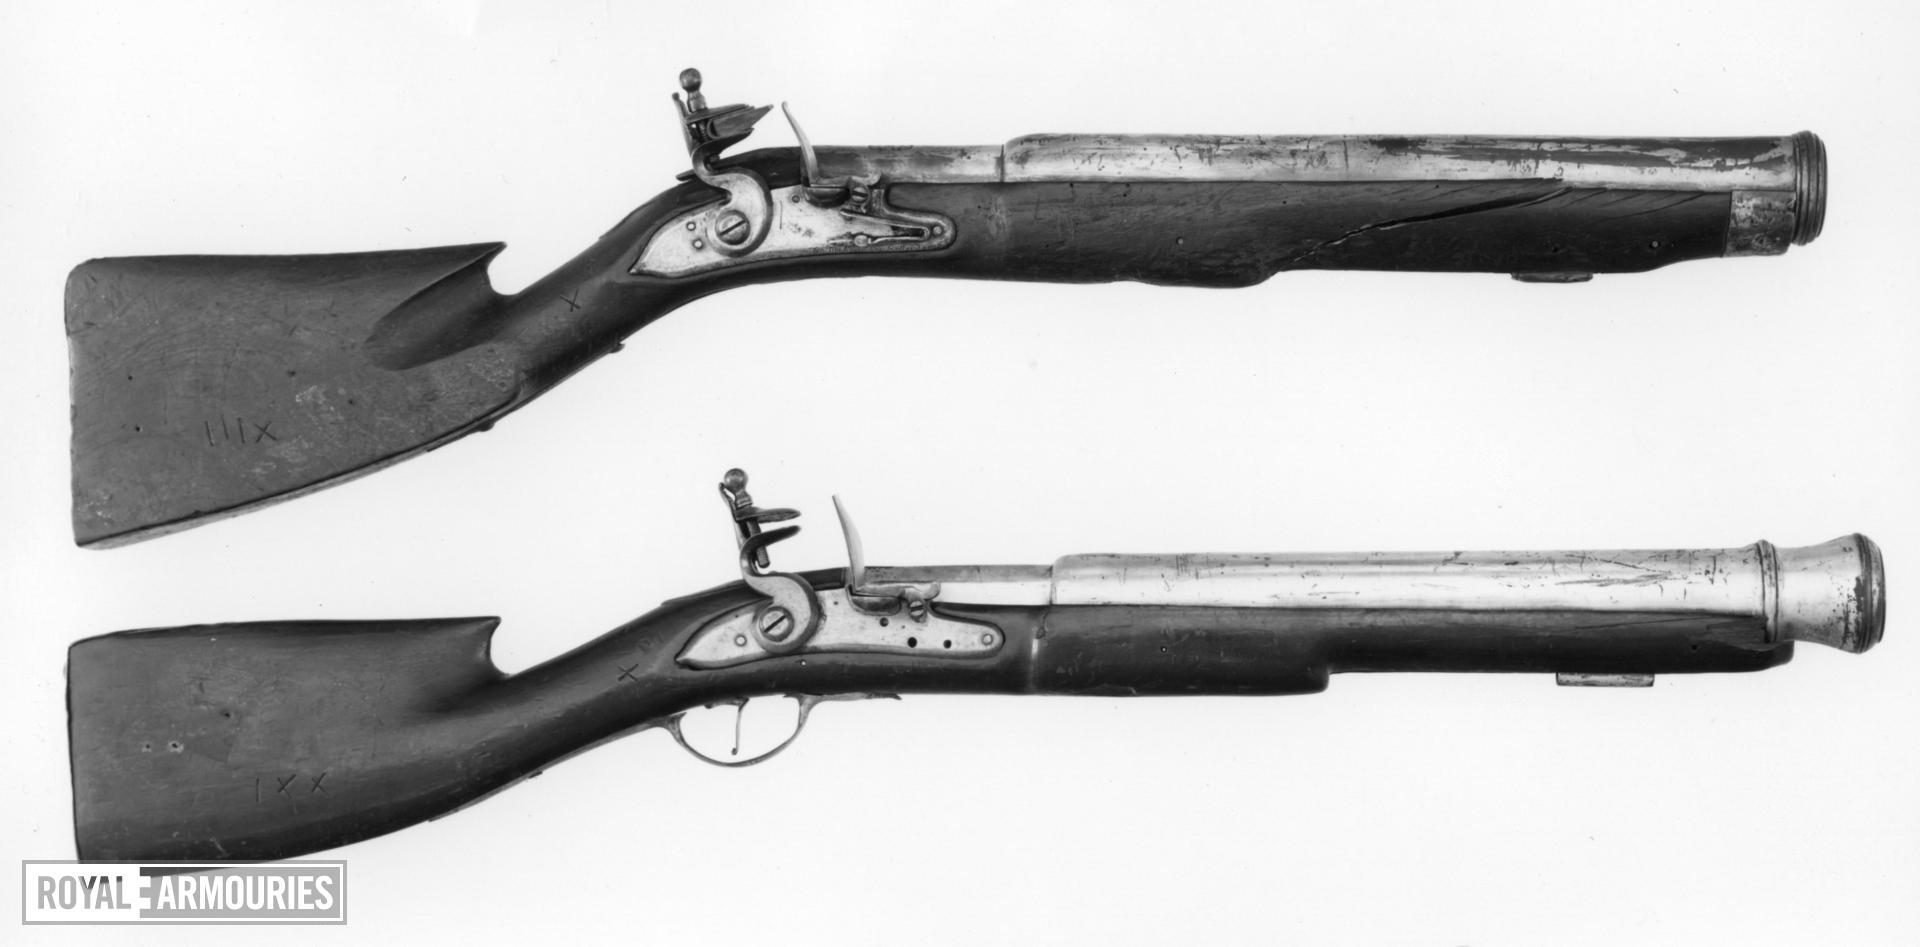 Flintlock military musketoon - By Jan Maliman